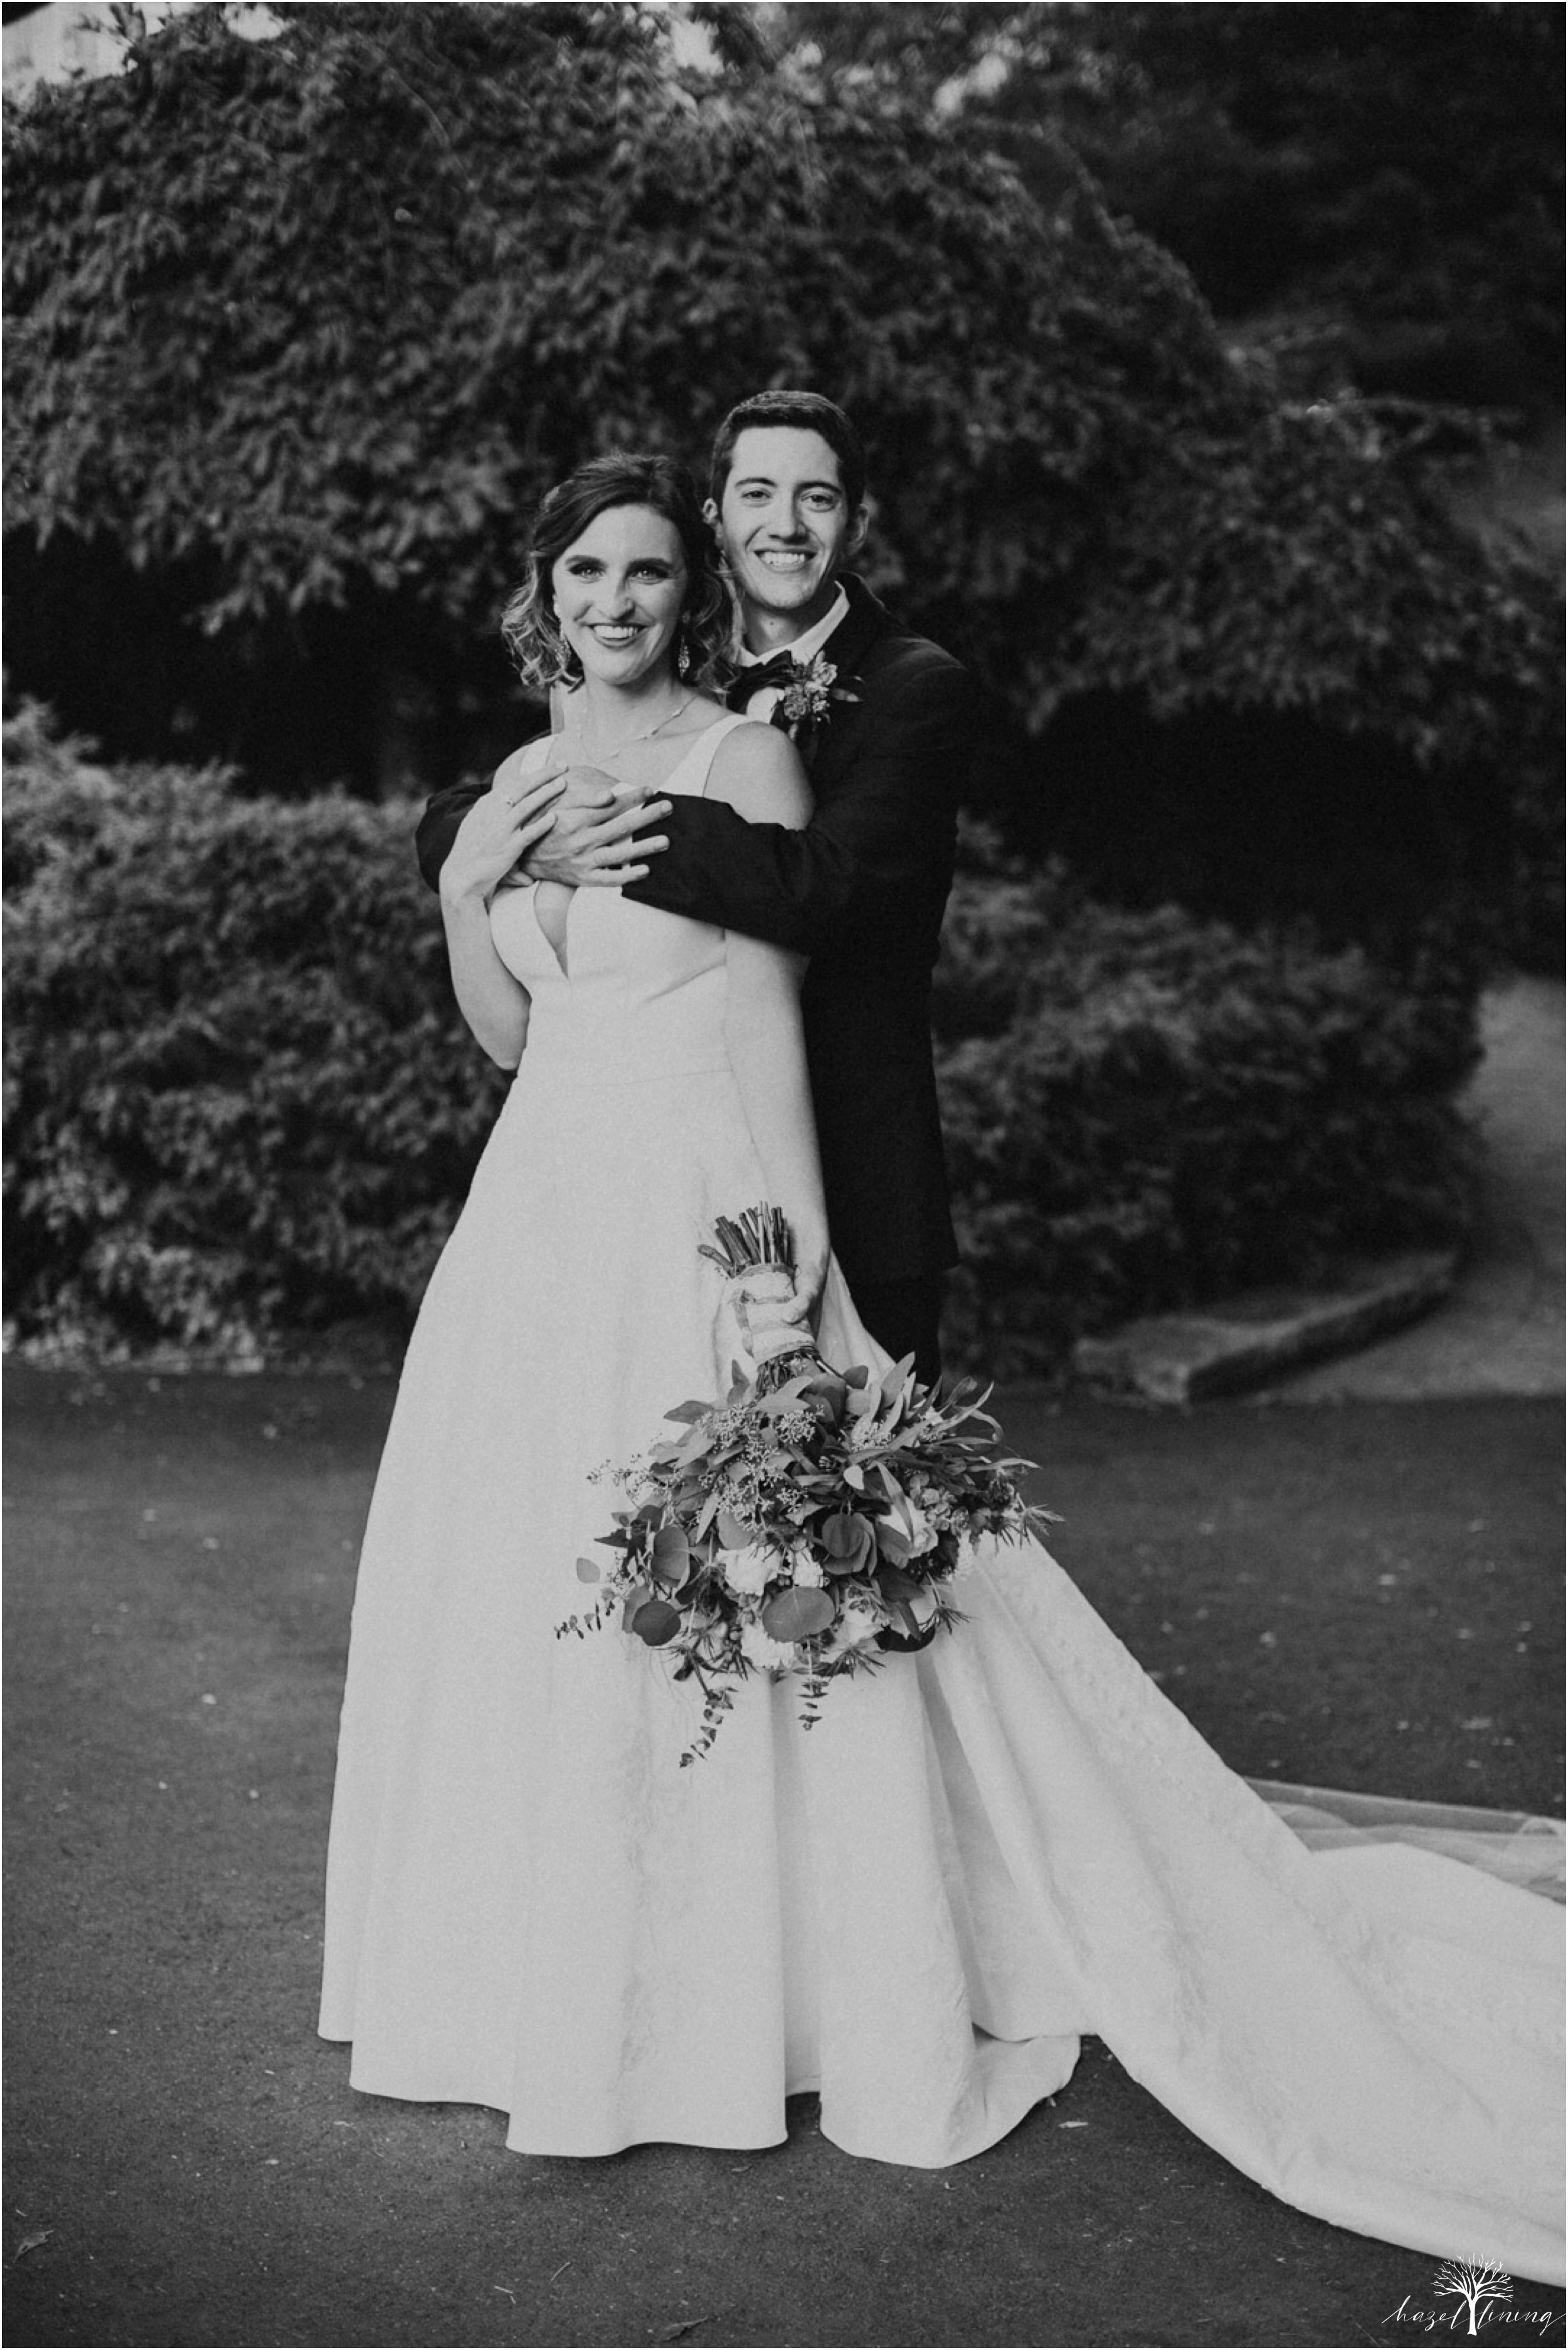 maureen-hepner-anthony-giordano-rose-bank-winery-newtow-pennsylvania-luxury-summer-wedding-hazel-lining-photography-destination-elopement-wedding-engagement-photography_0104.jpg